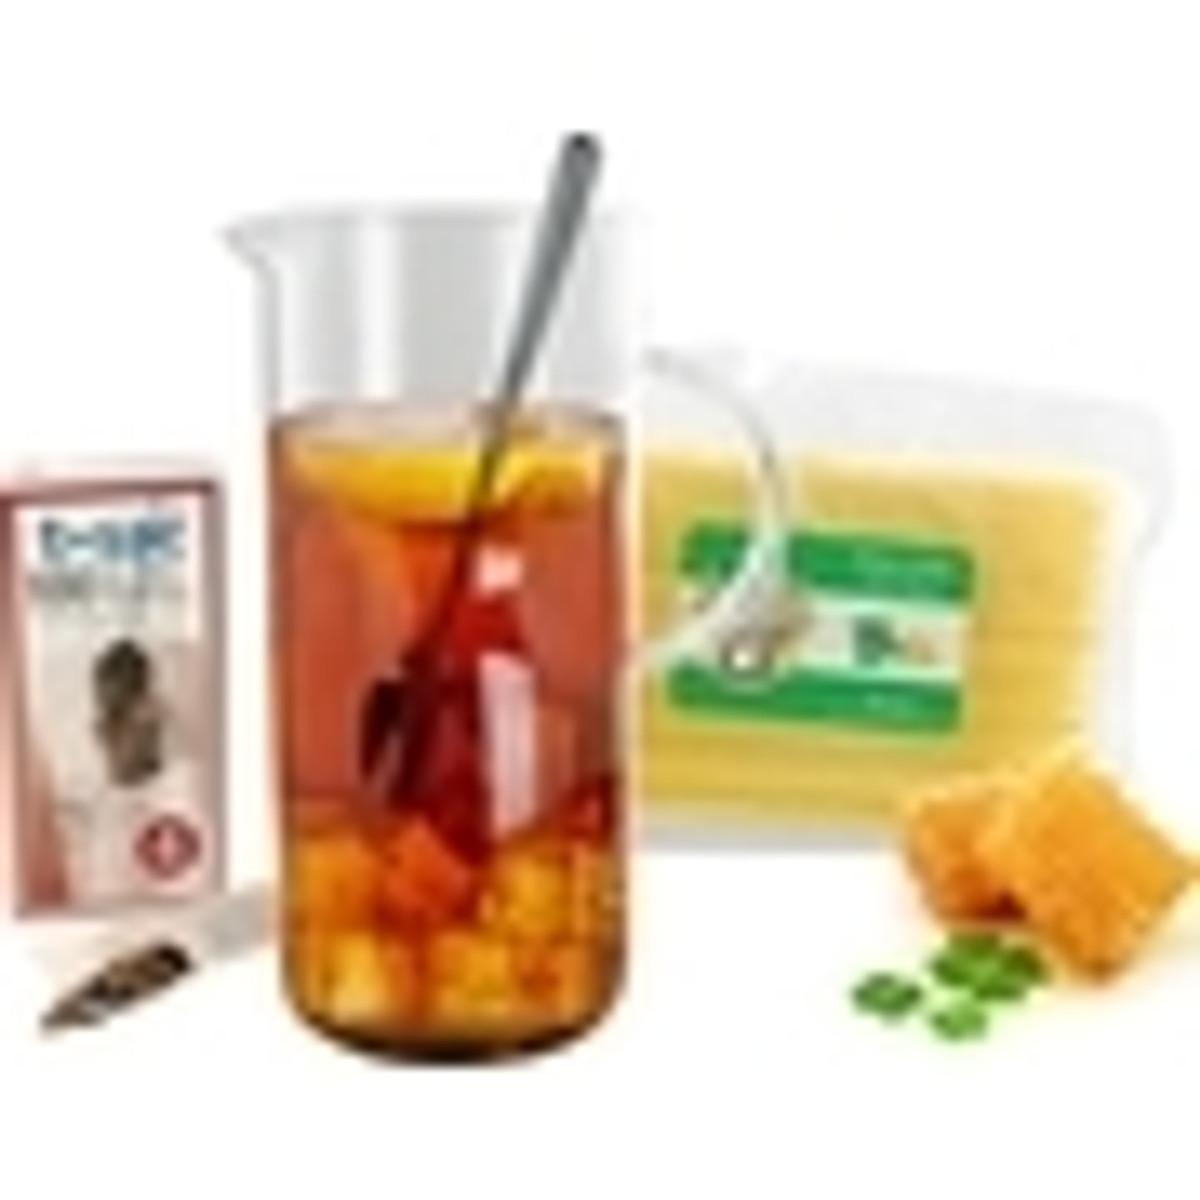 Iced Tea Accessories